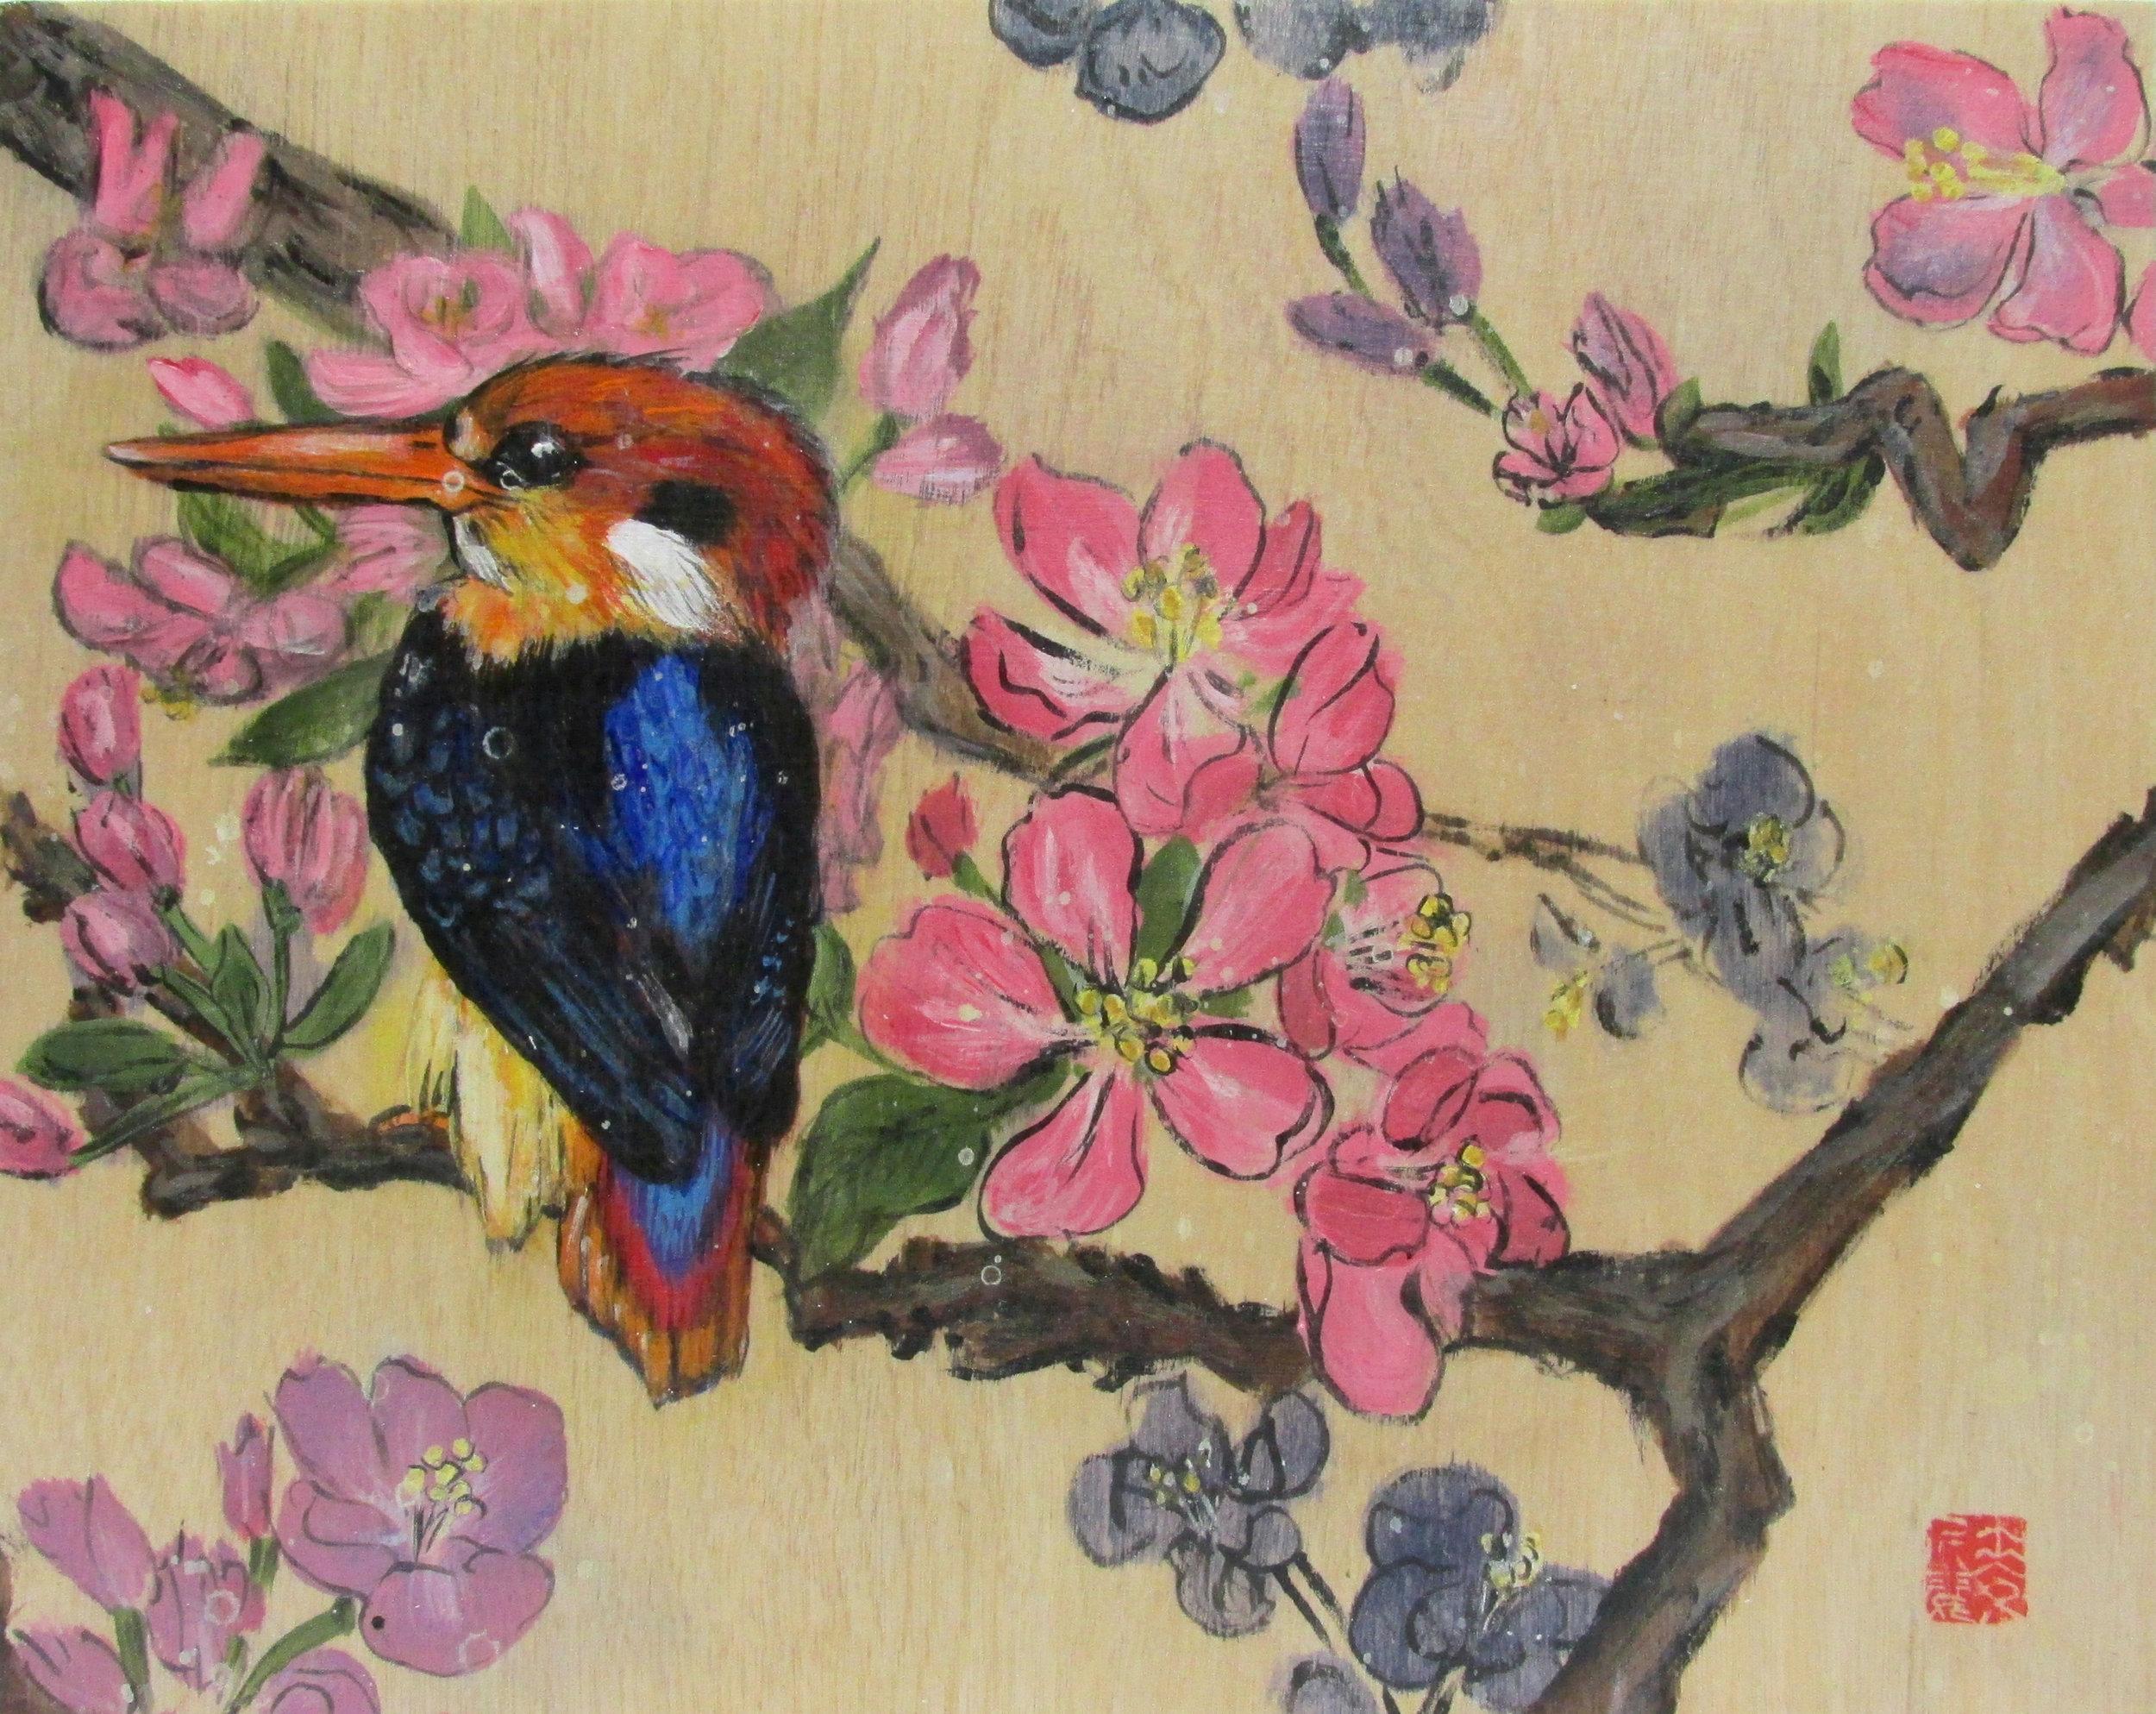 2015-Oriental-Kingfisher-on-a-Cherry-Blossom-Branch-by-Ingrid-Alvarez.jpg